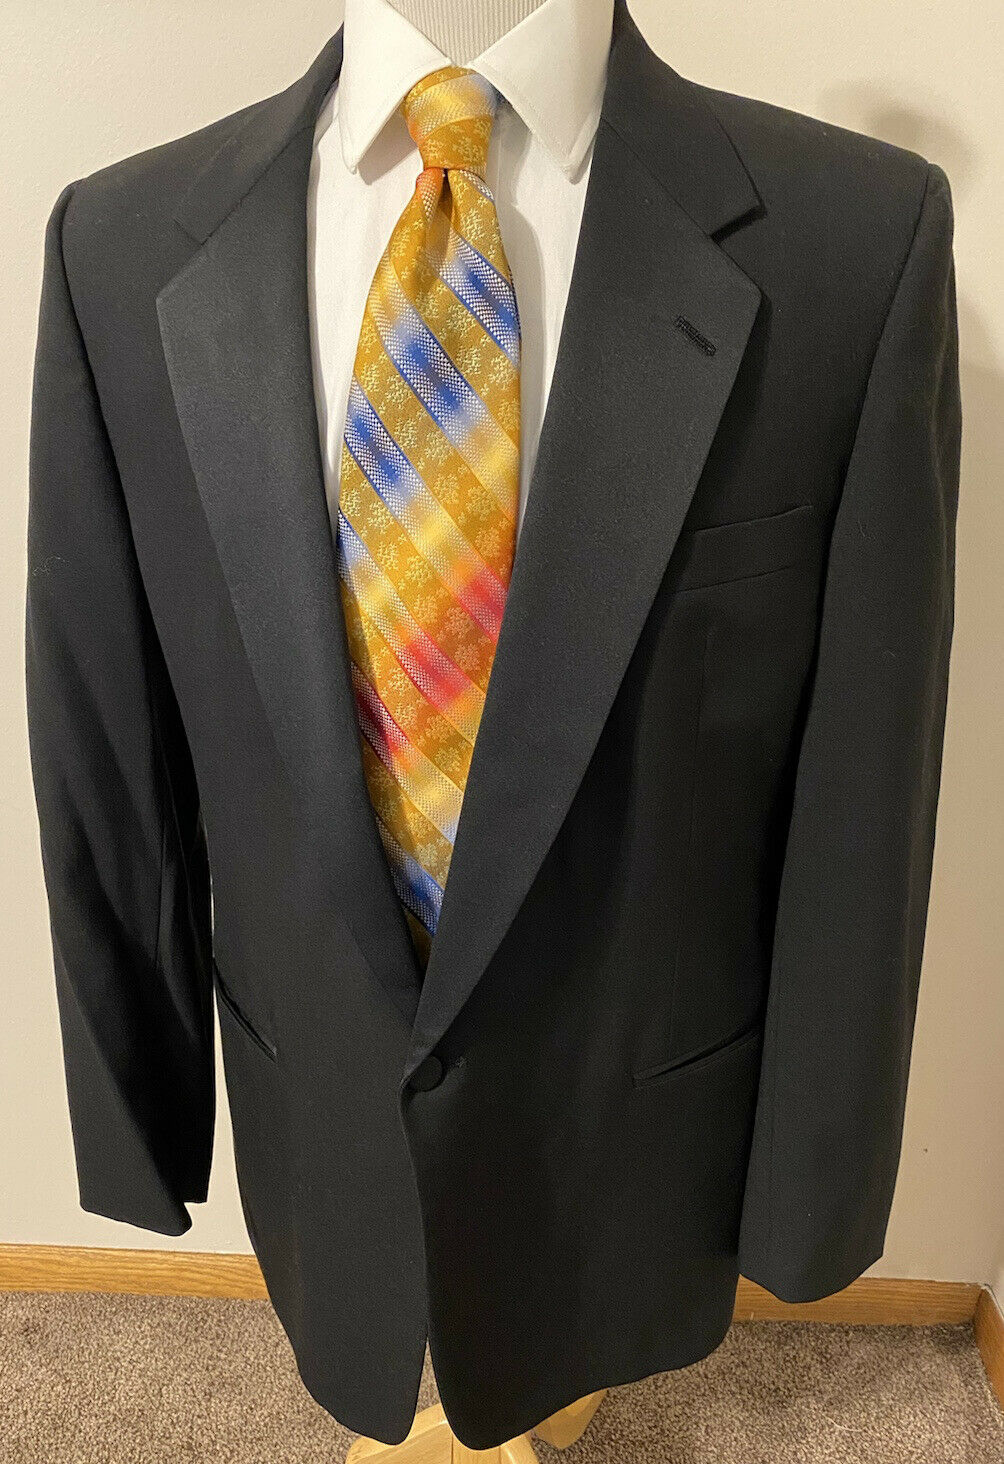 Christian Dior Men's Black 100% Wool Sport Coat Tuxedo Blazer Tux Jacket Sz 42L